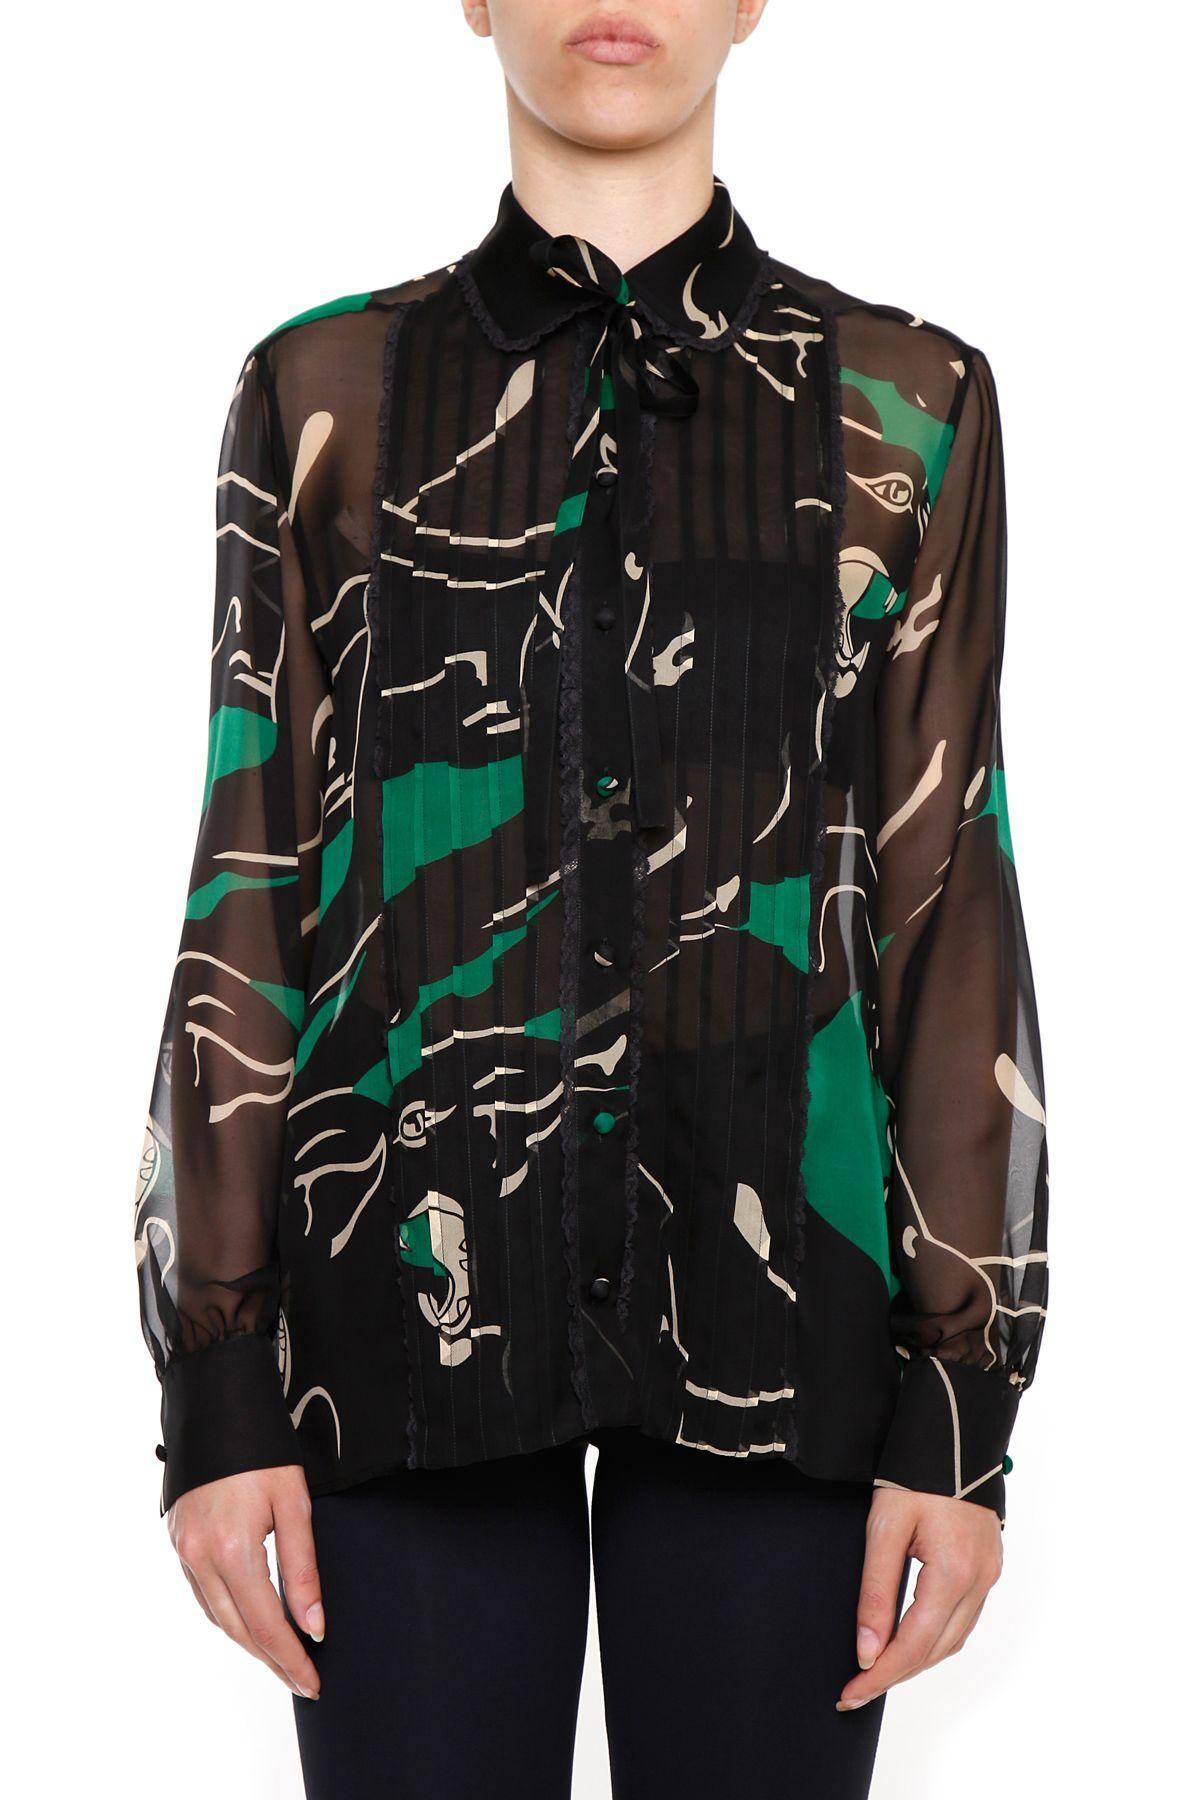 Valentino Panther Print Shirt In Verde Nero|verde